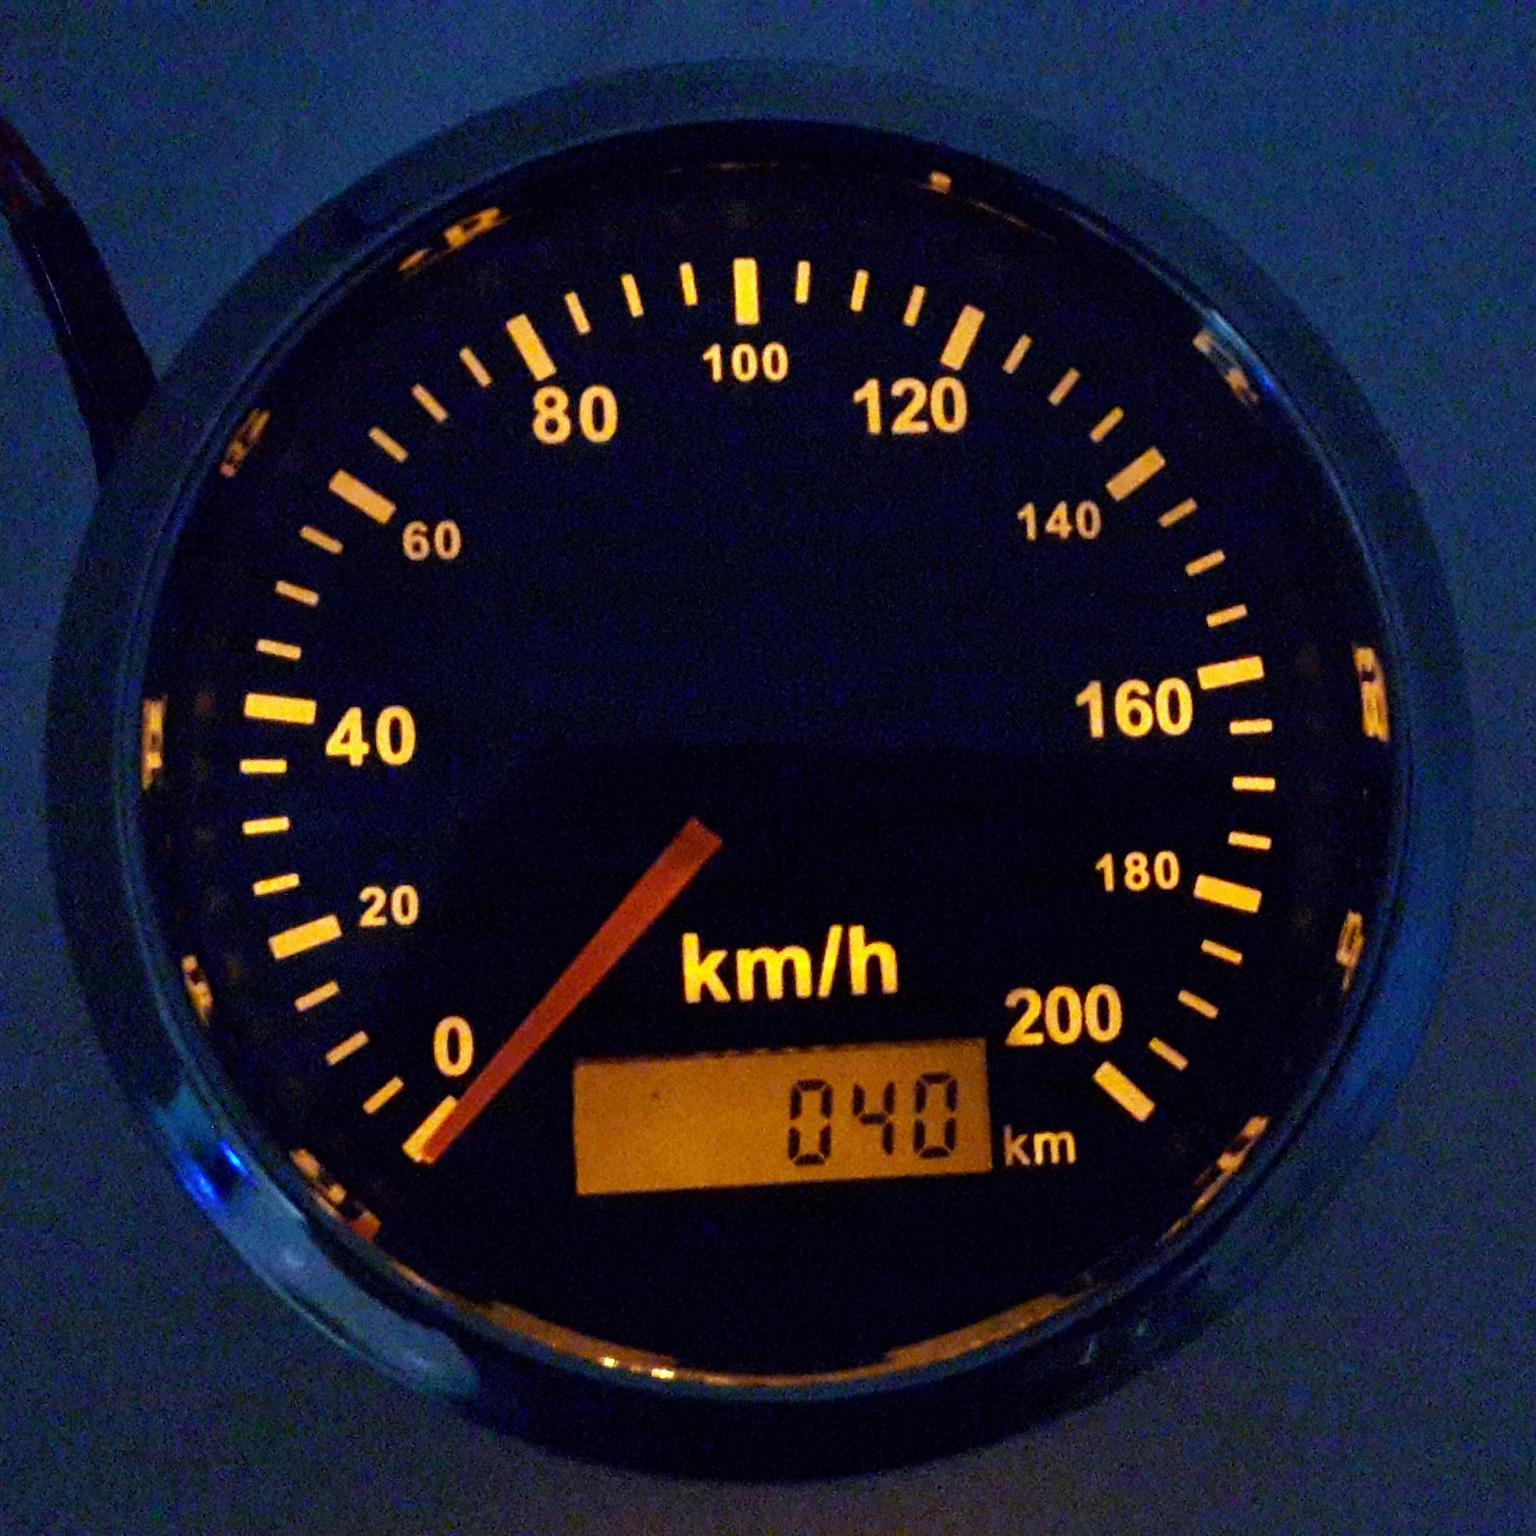 MERCEDES BENZ AXOR SPEEDOMETER PROBLEMS? GPS SPEEDOMETER IS THE SOLUTION